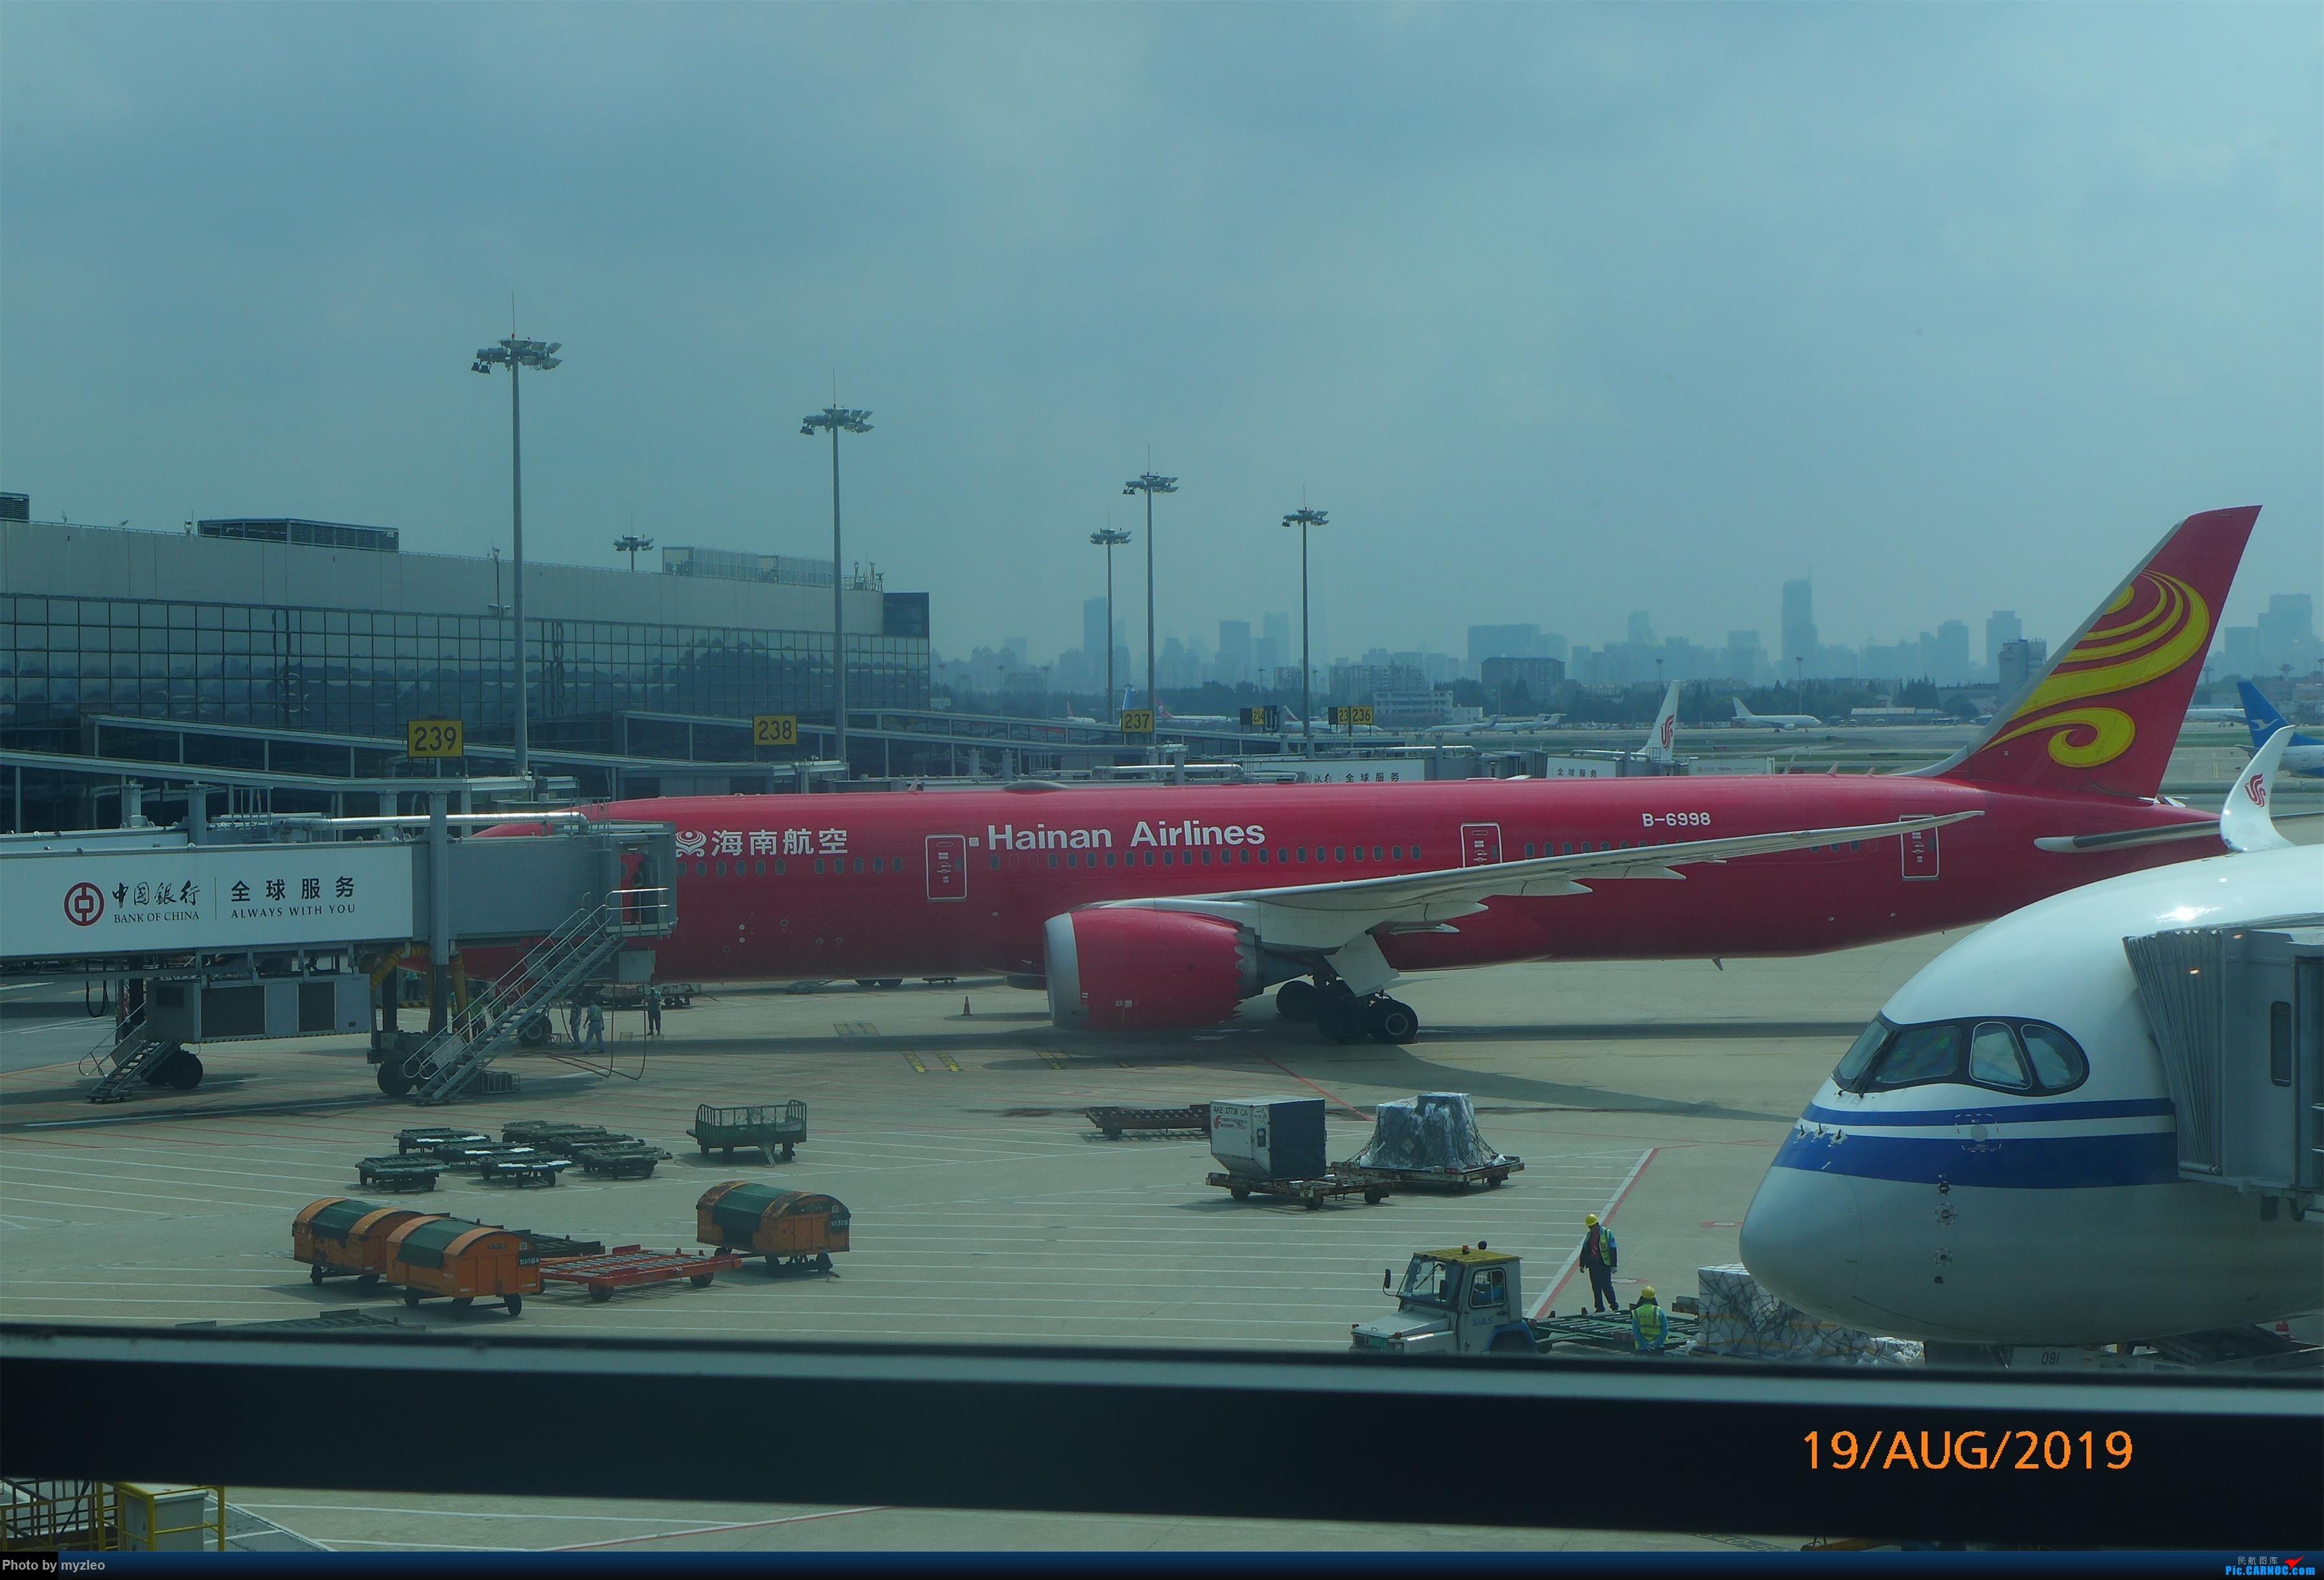 Re:[原创]【myzleo的游记5.1】梦圆一九(1)首搭国航359,北京城里到处走 BOEING 787-9 B-6998 中国上海虹桥国际机场